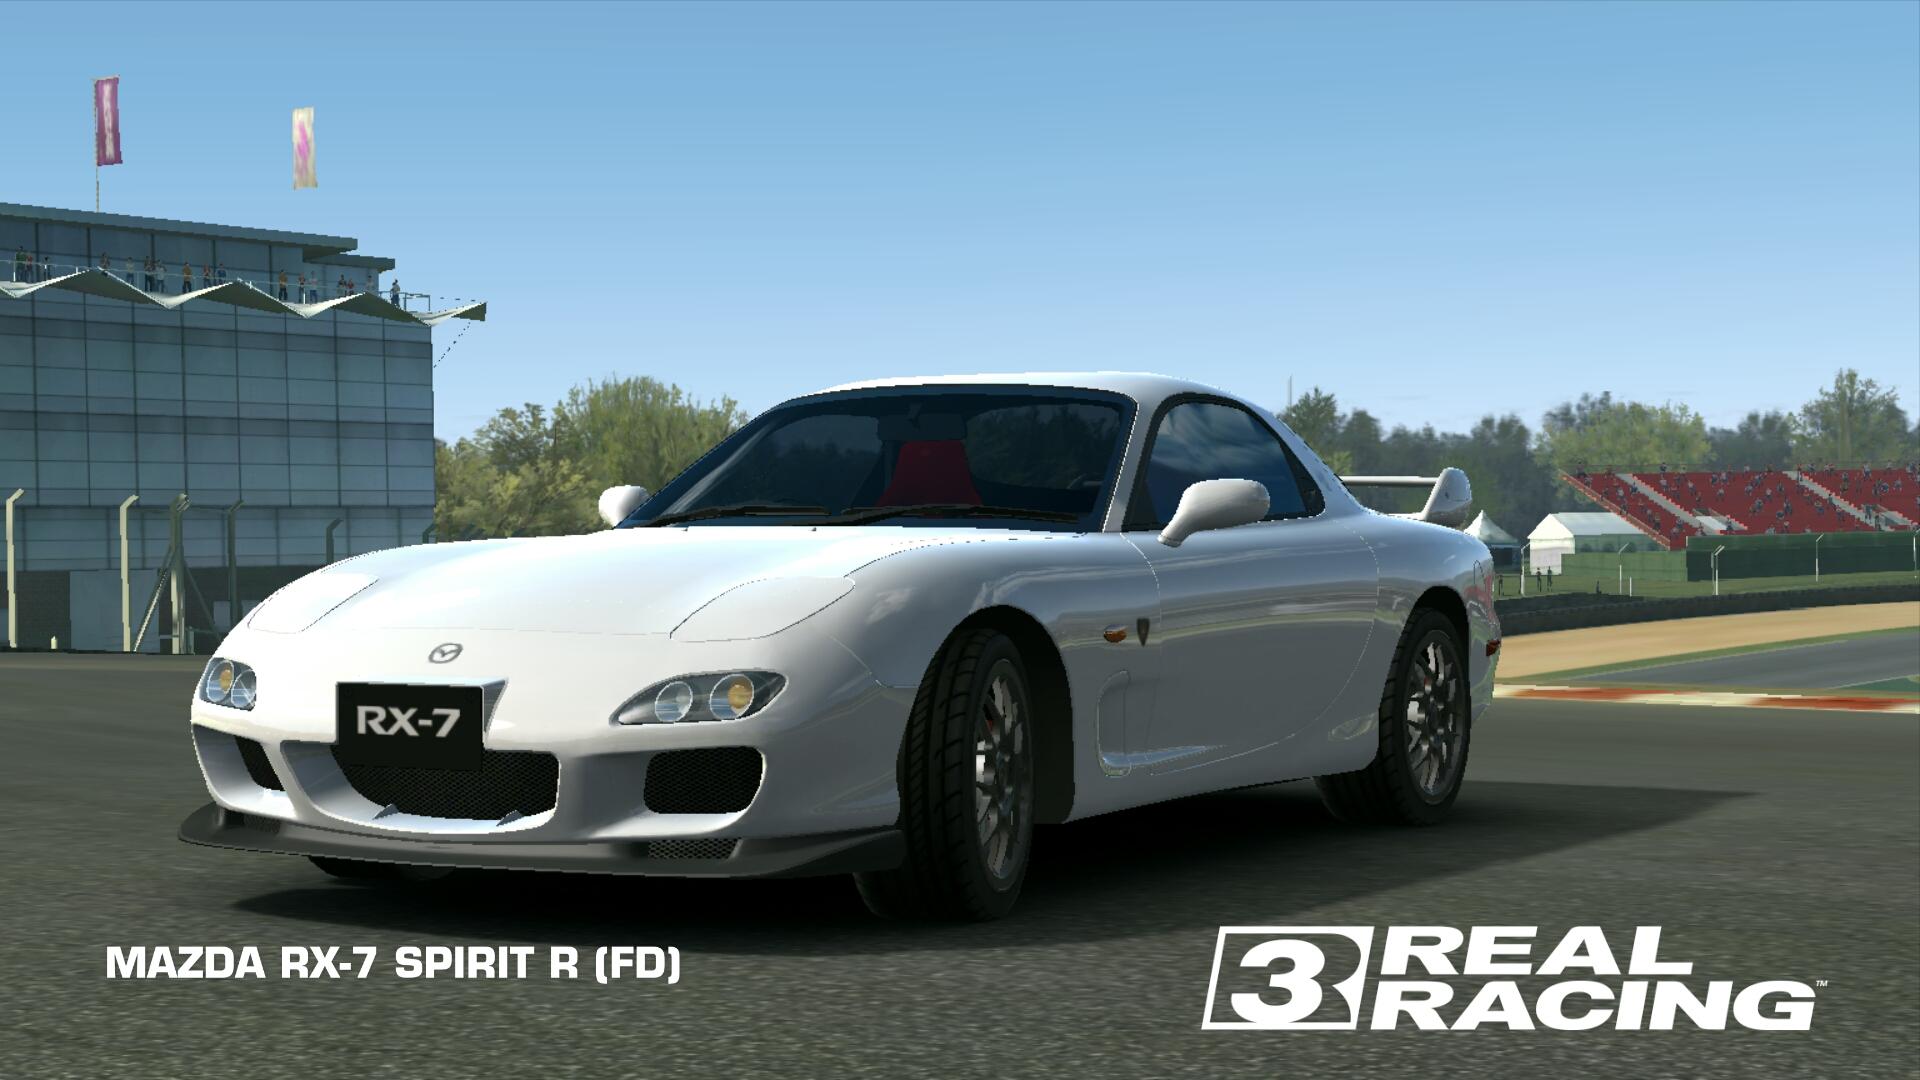 Mazda Rx 7 Spirit R Fd Real Racing 3 Wiki Fandom Powered By Wikia